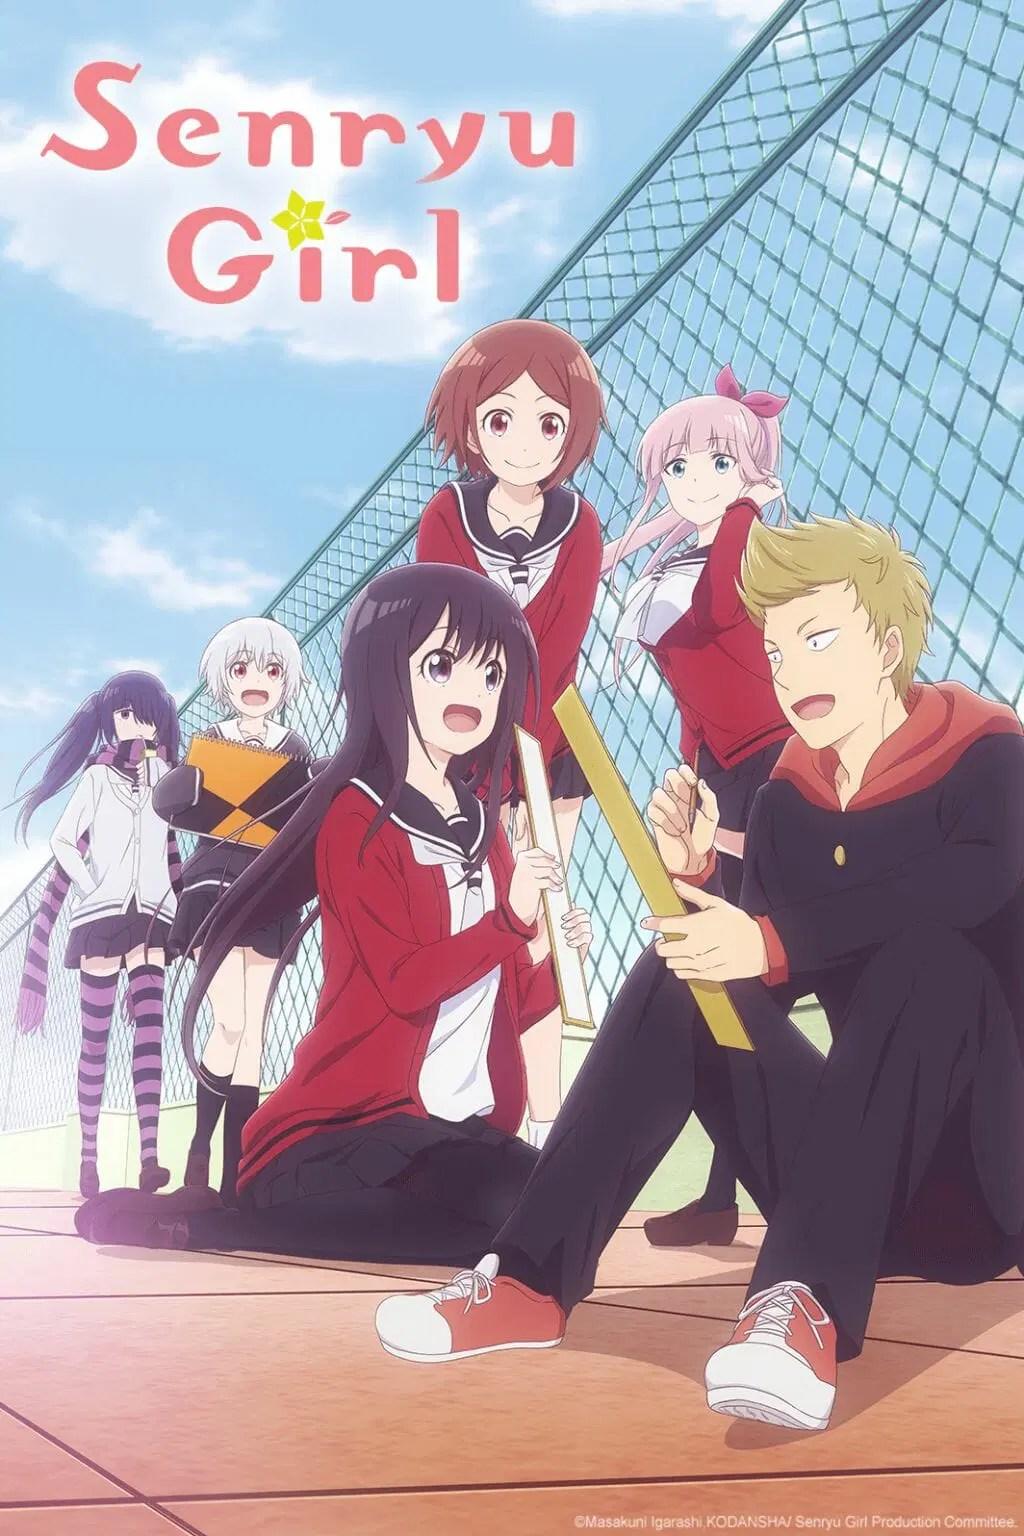 Senryu Girl Anime Visual